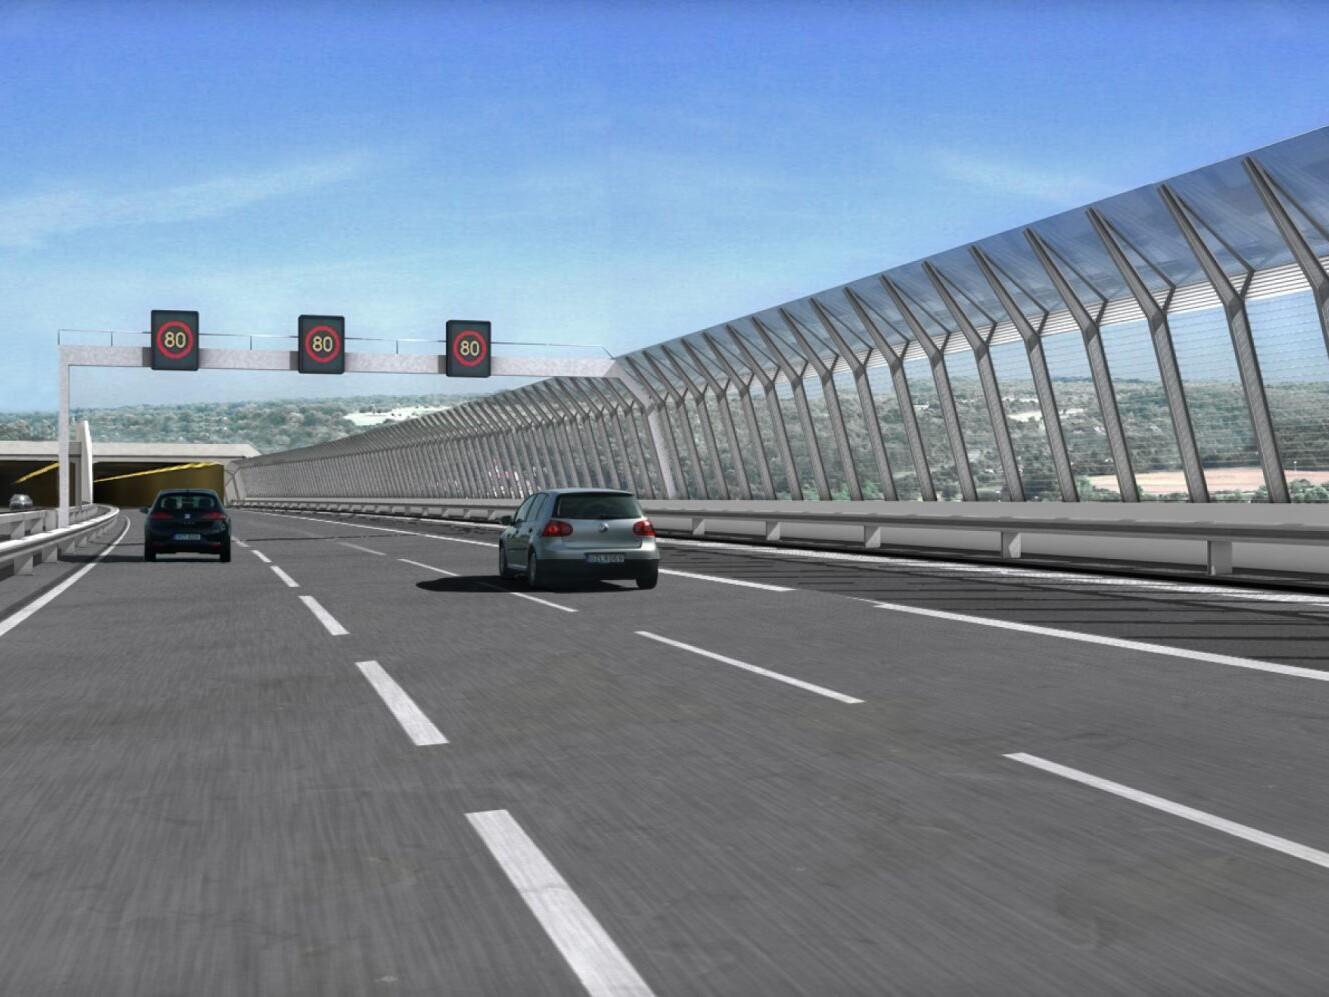 Talbrücke Heidingsfeld, Visualisierung